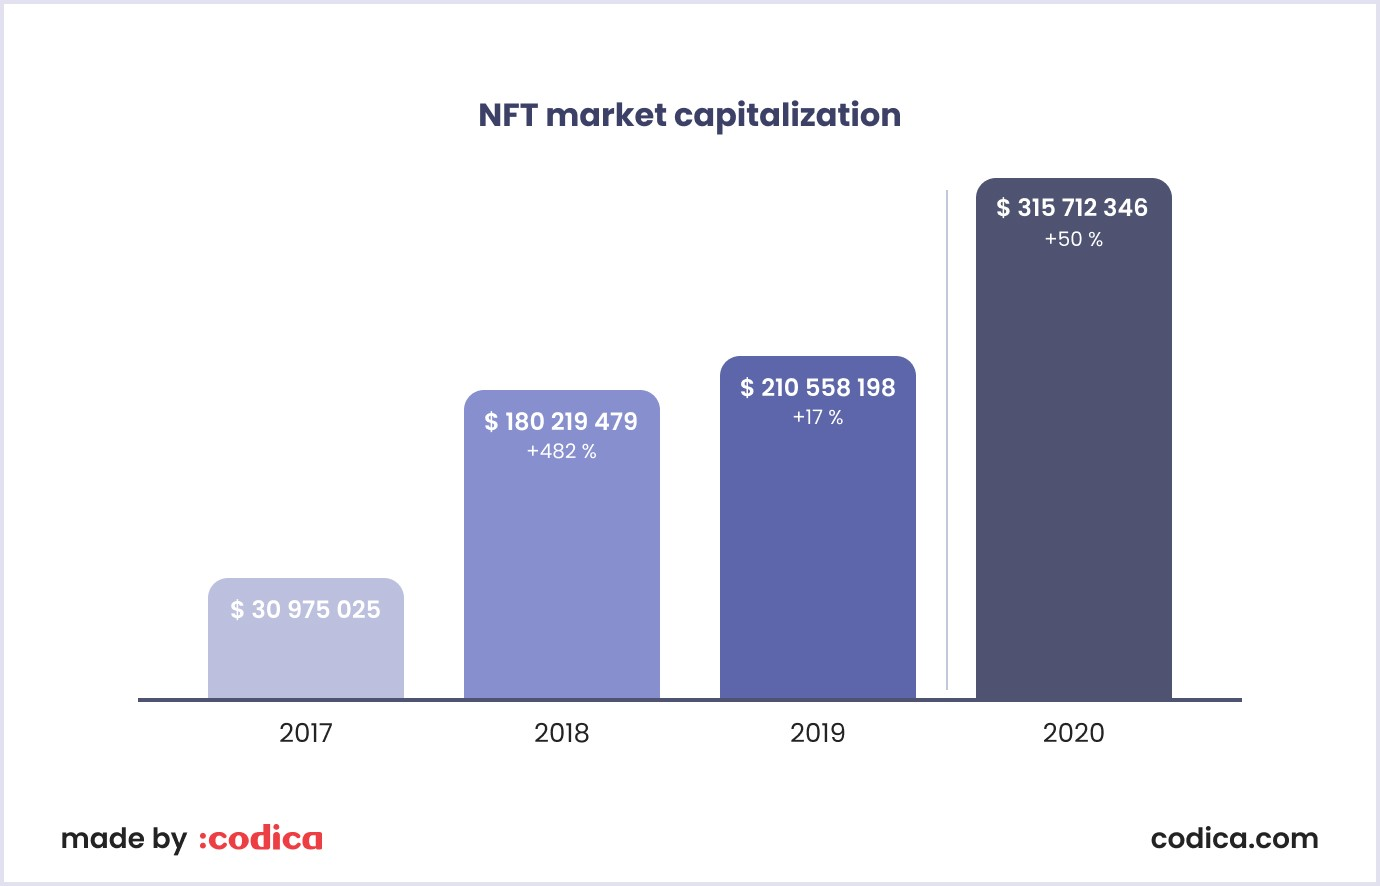 NFT market capitalization